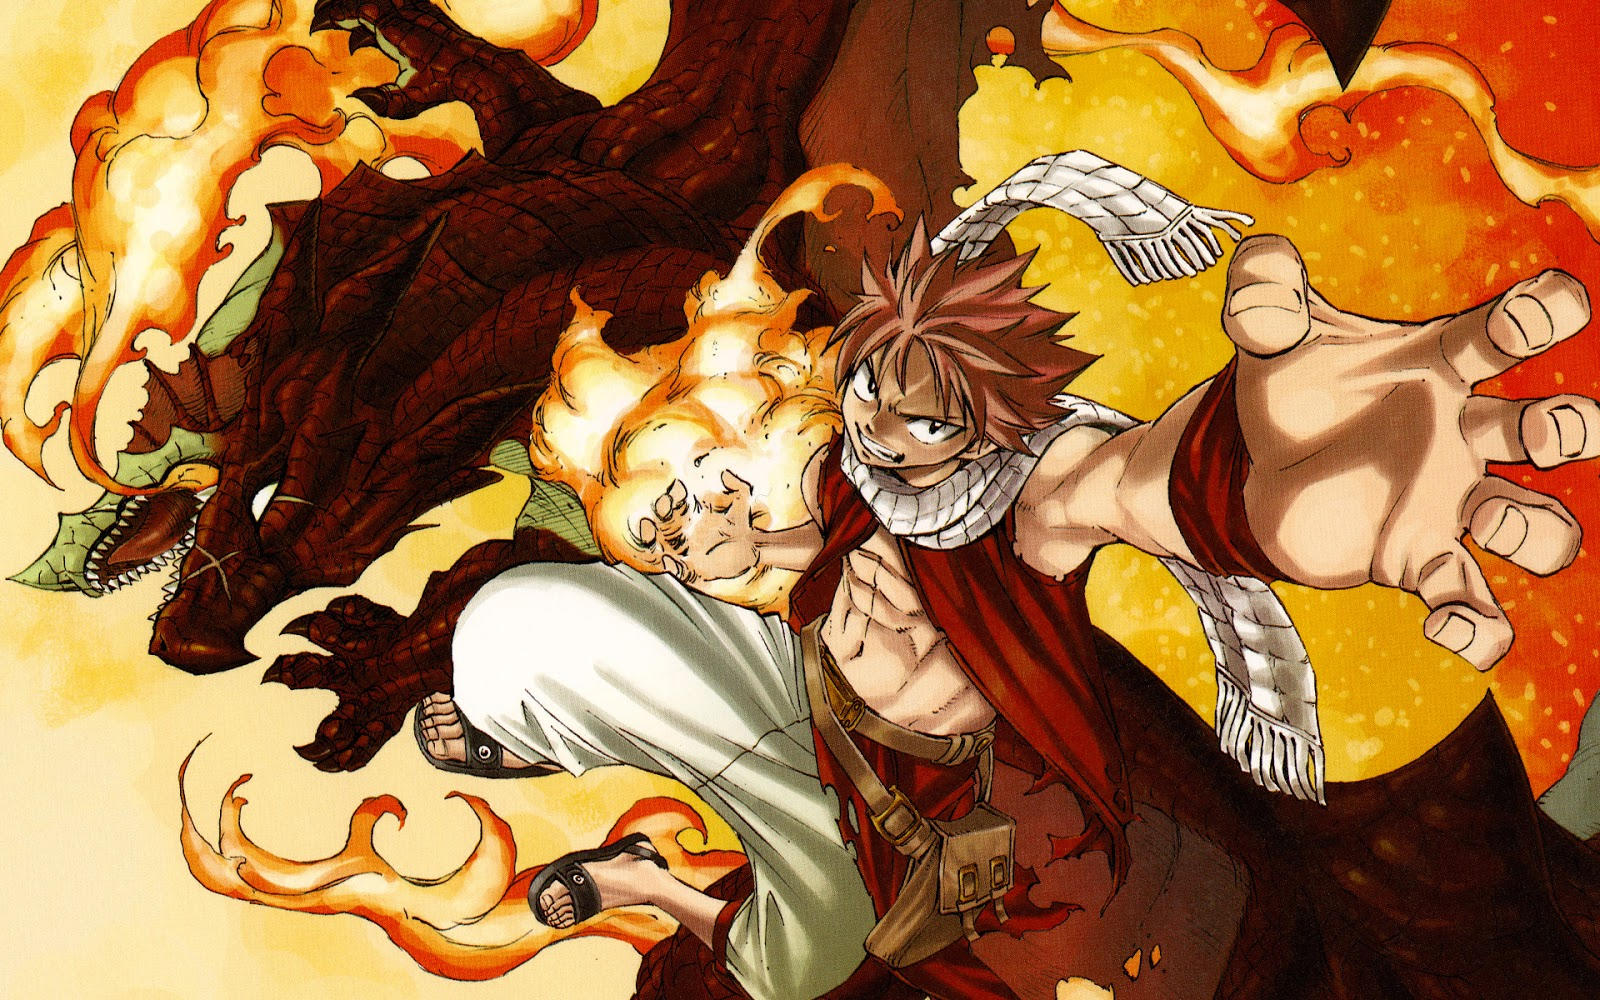 Fairy Tail Natsu and Igneel 84 HD Wallpaper 1600x1000